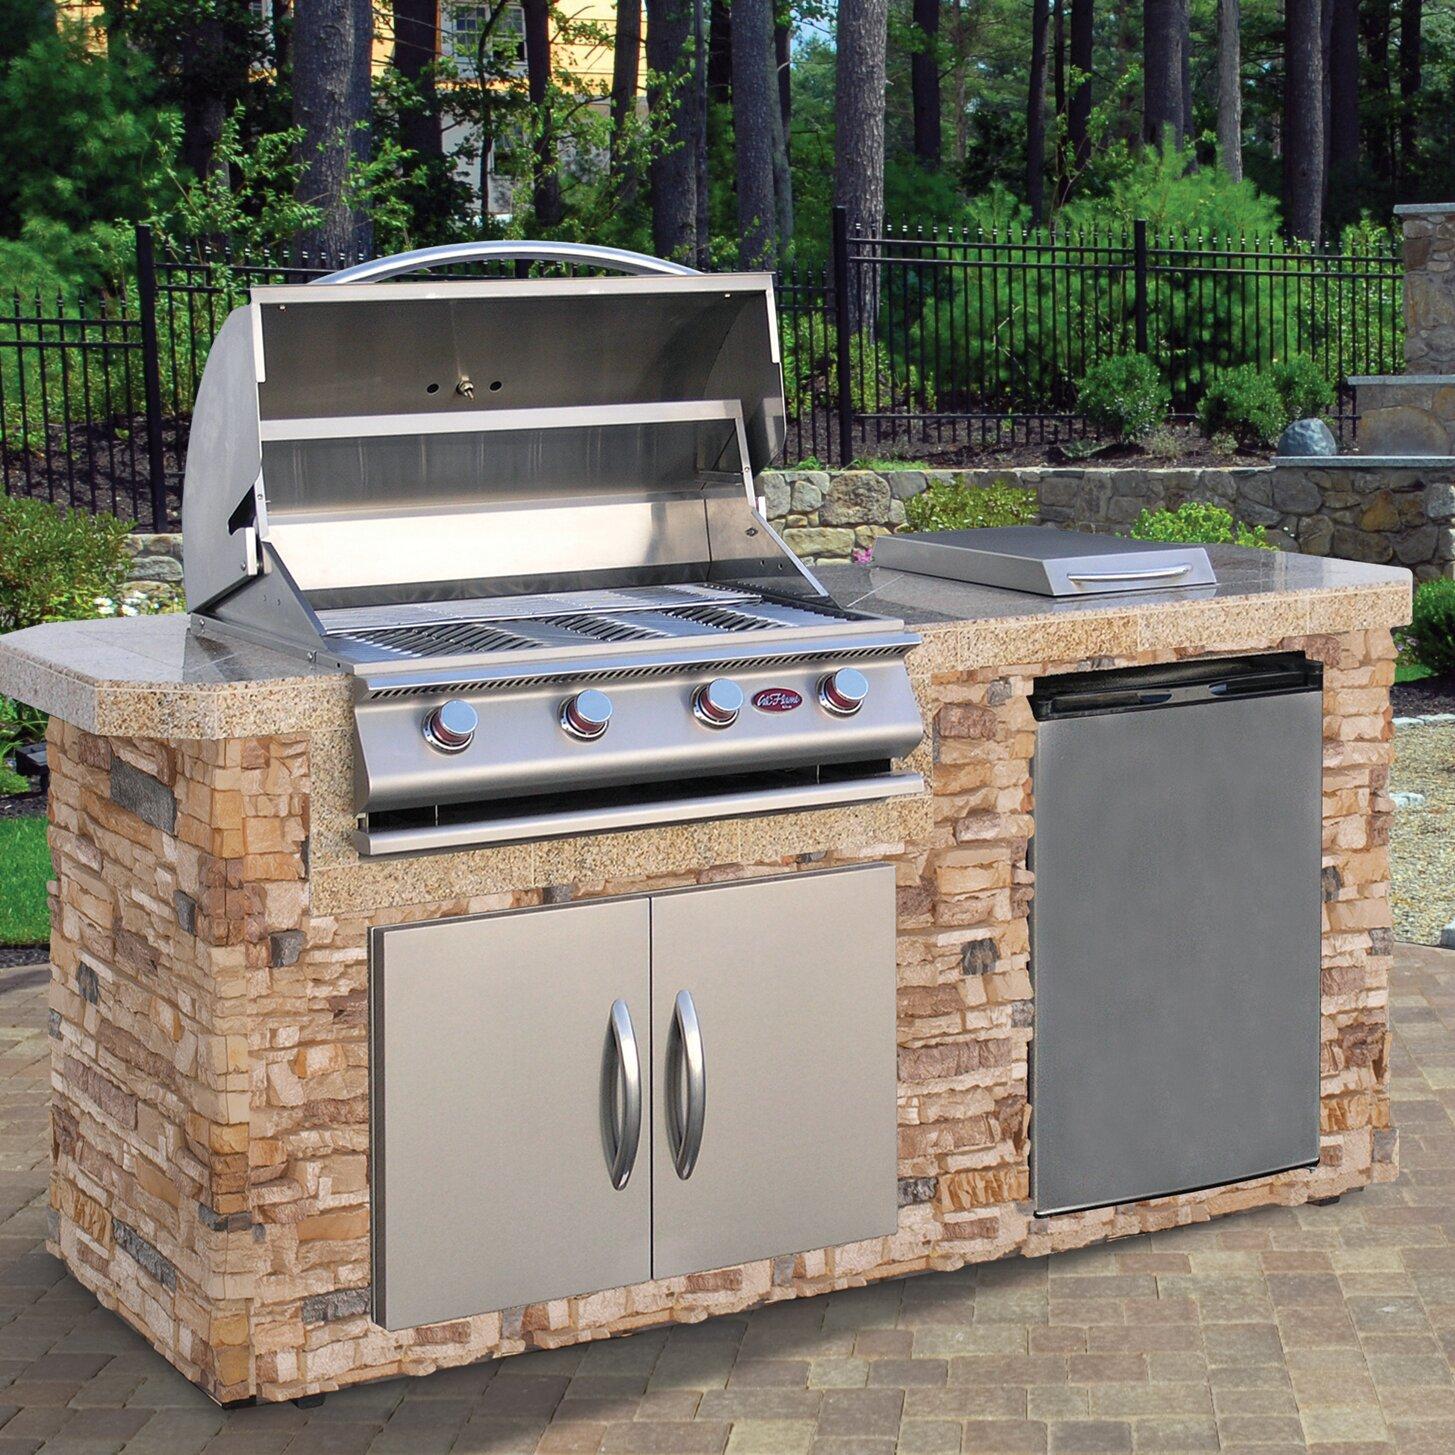 Outdoor Gas Barbecue Grills ~ Calflame quot burner liquid propane gas grill wayfair